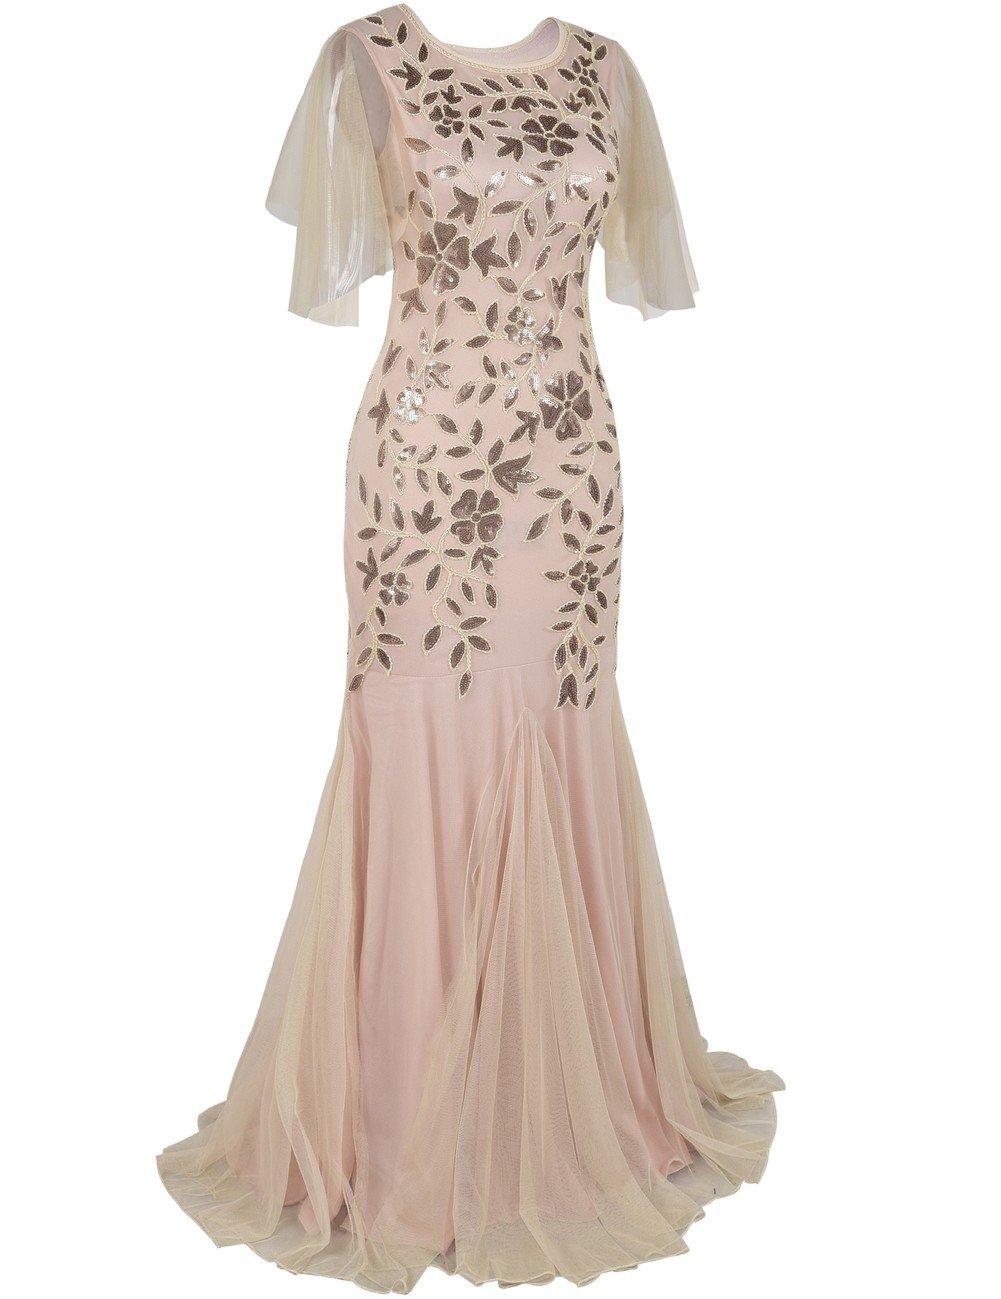 27b5b0d7c1e0 kayamiya Women's 1920s Maxi Long Prom Gowns Sequin Mermaid Hem Evening Dress  with Sleeves < Dresses < Clothing, Shoes & Jewelry - tibs